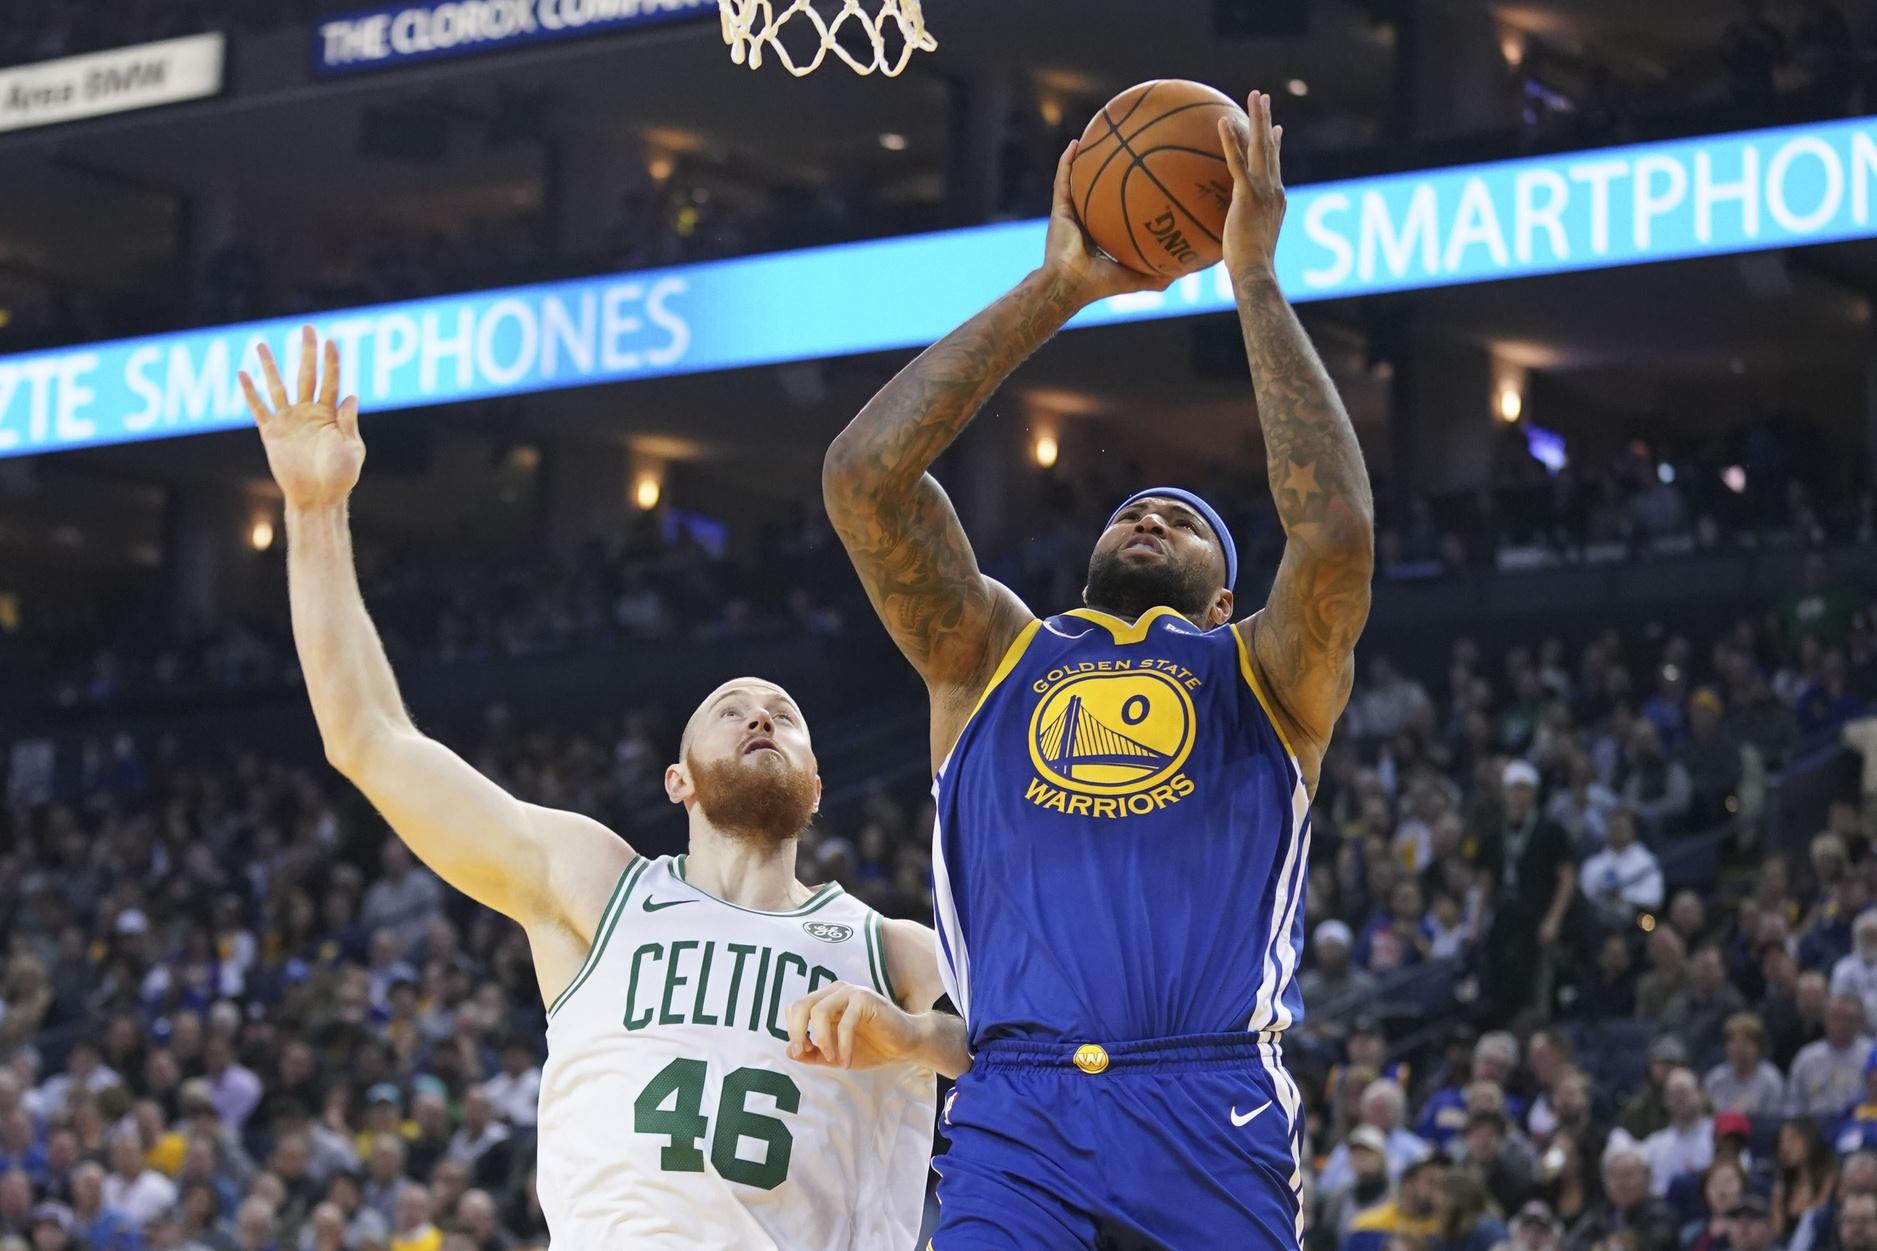 Celtics fan banned for directing racial slur at Boogie Cousins